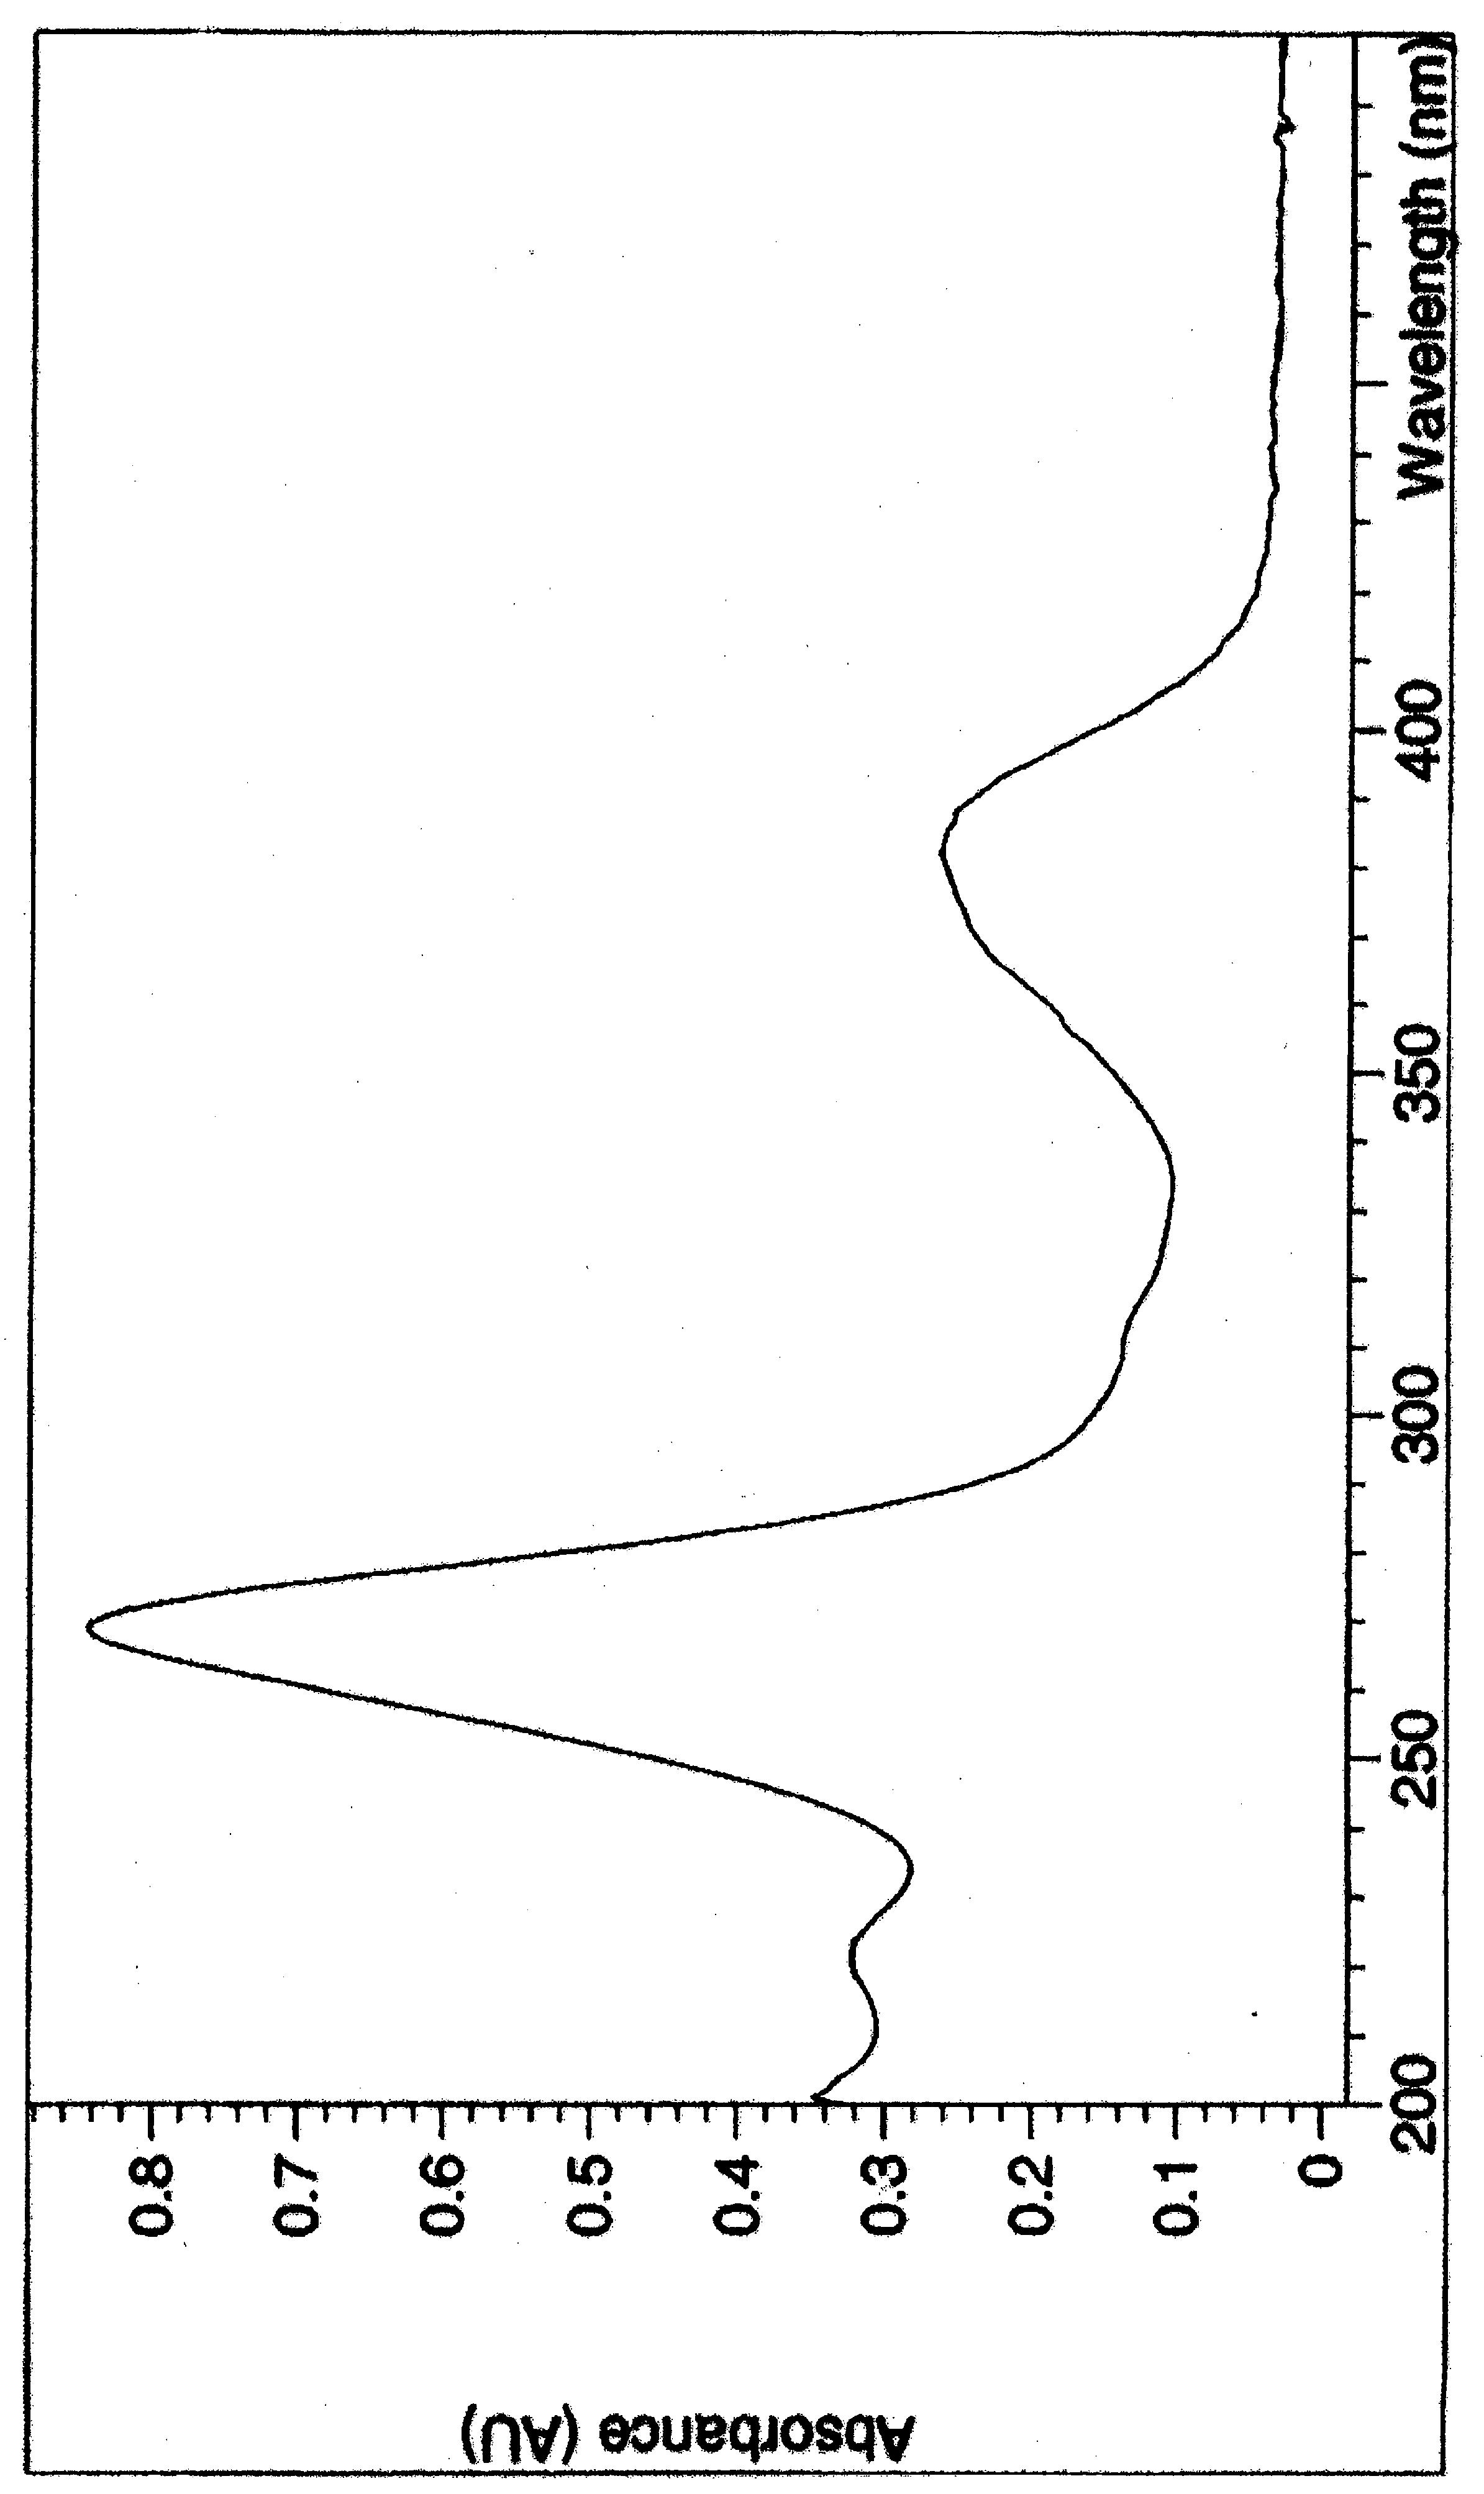 WO2009101956A1 - 新規 fki-3864 物質およびその製造方法         - Google PatentsFamily